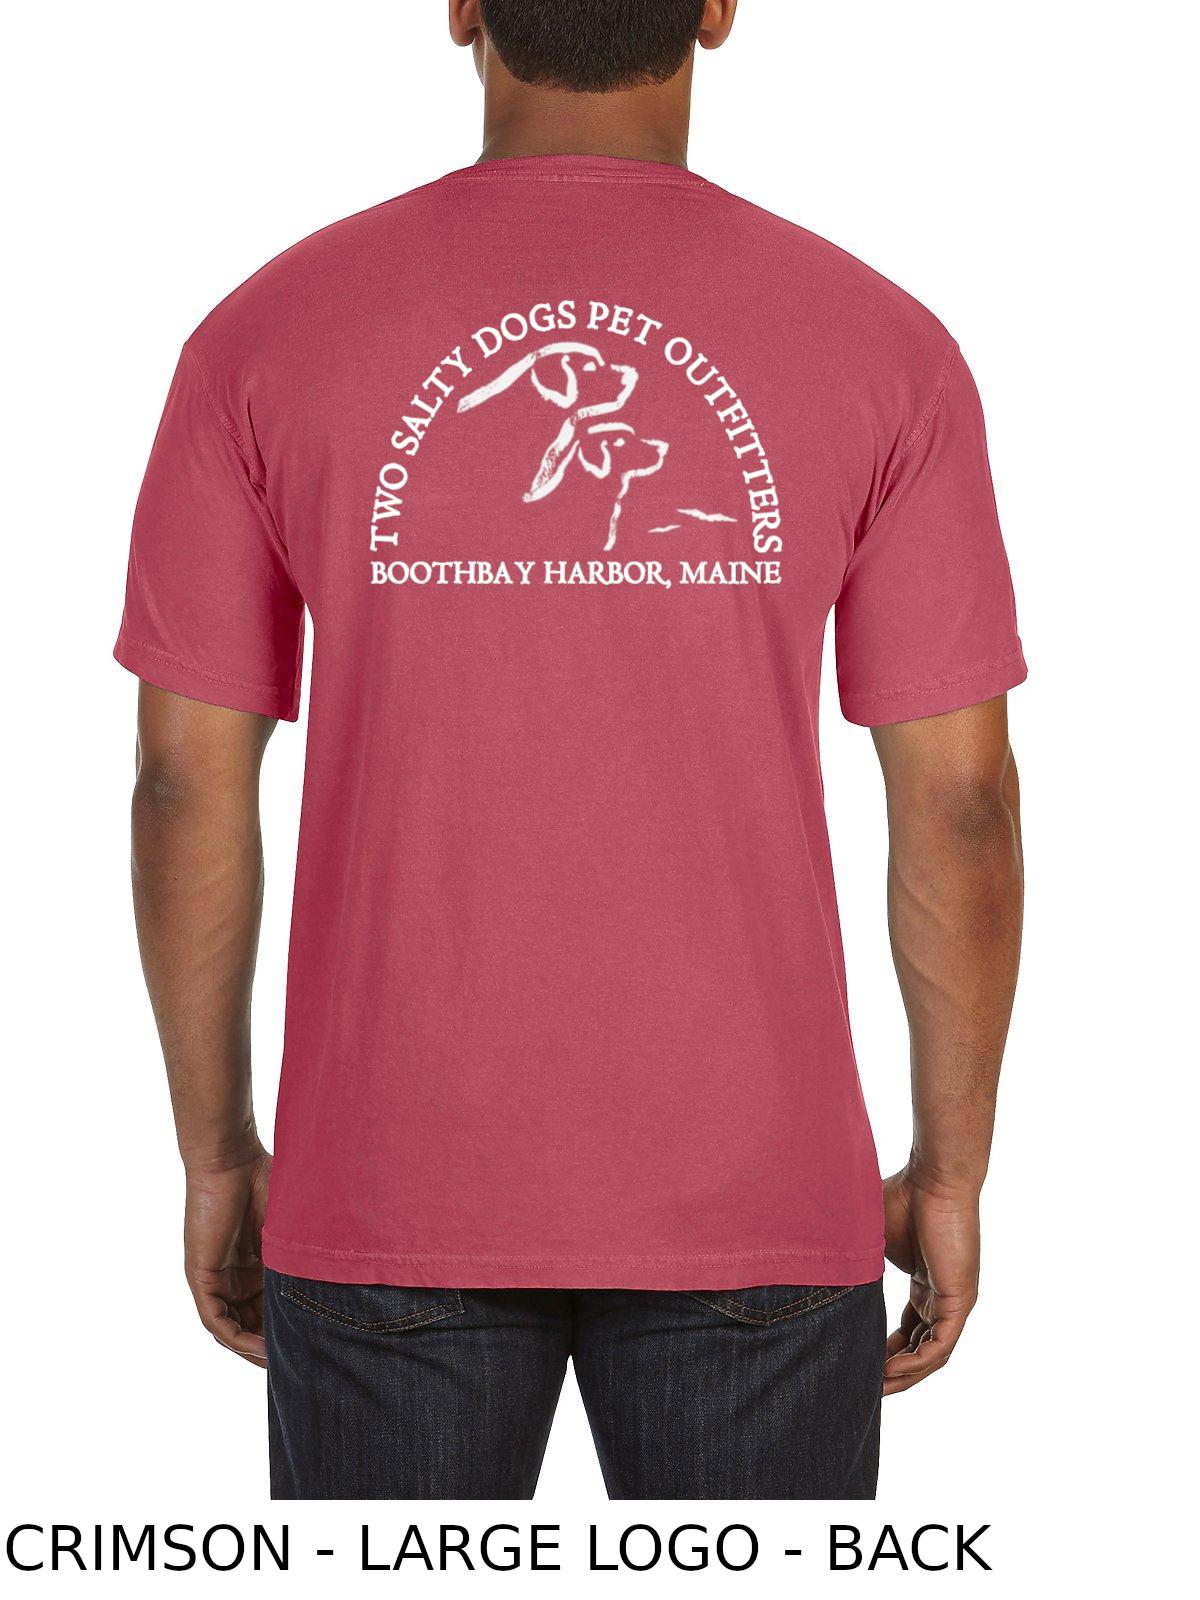 bbha-ss-t-shirt-pocket-crimson-back